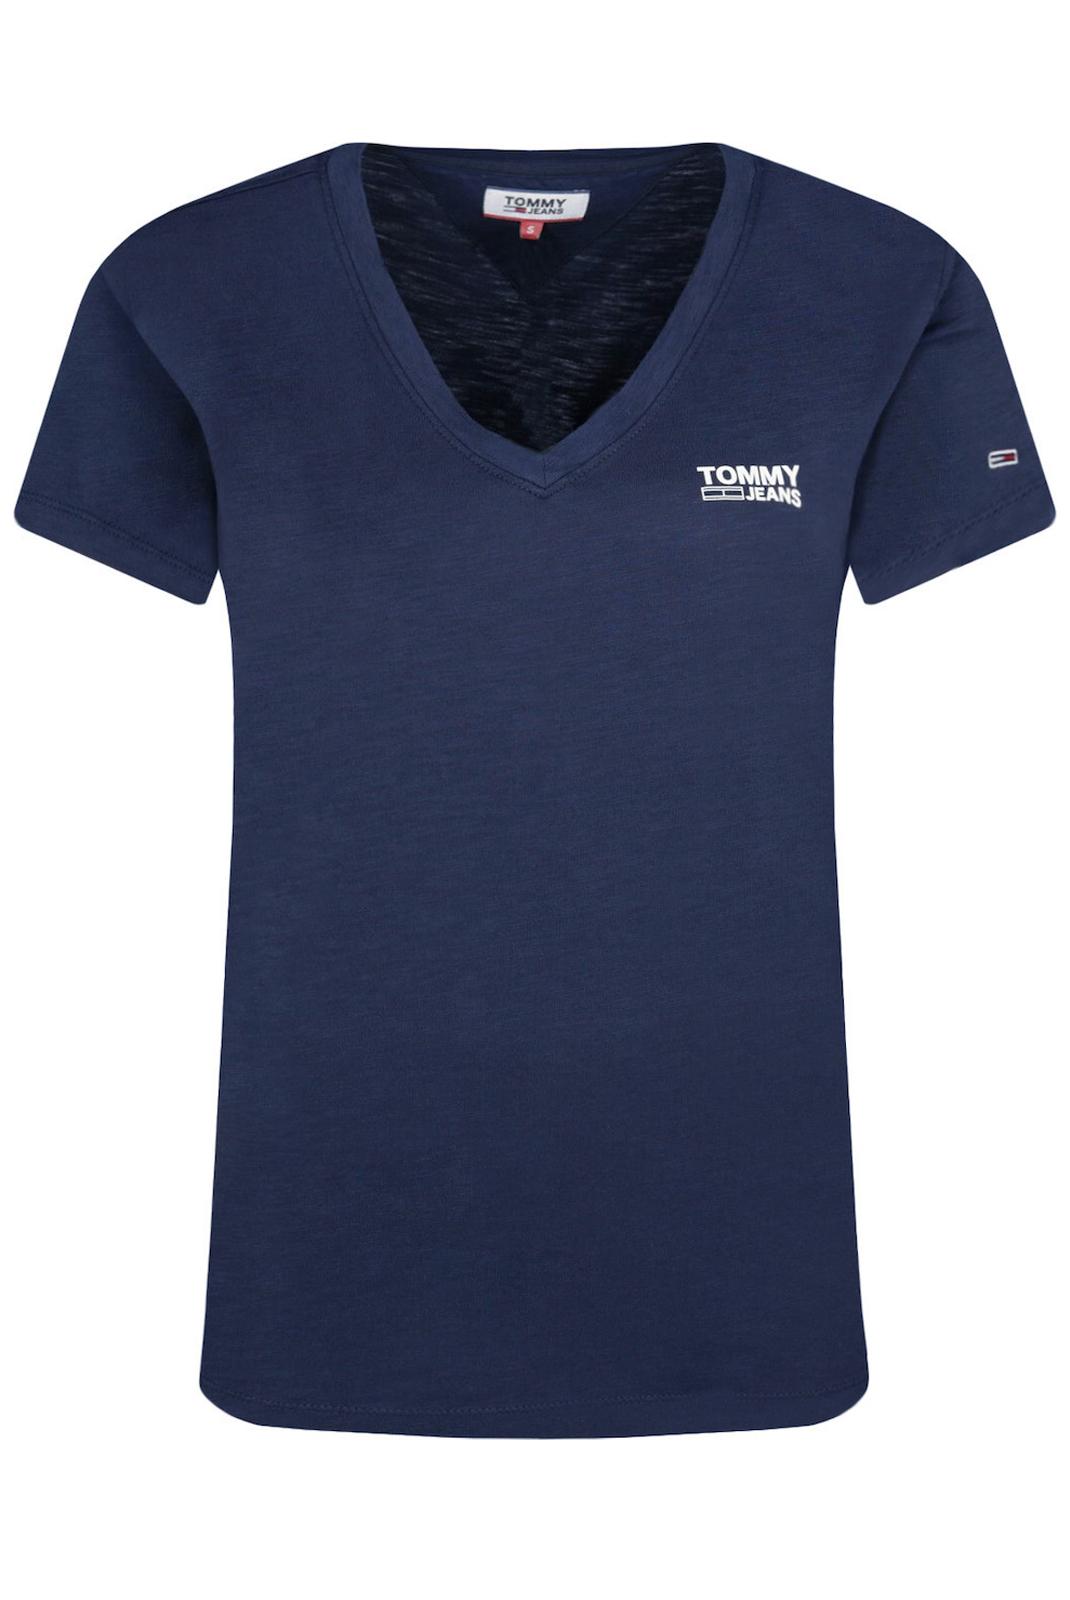 Tee shirt  Tommy Jeans DW0DW08669 C87 marine